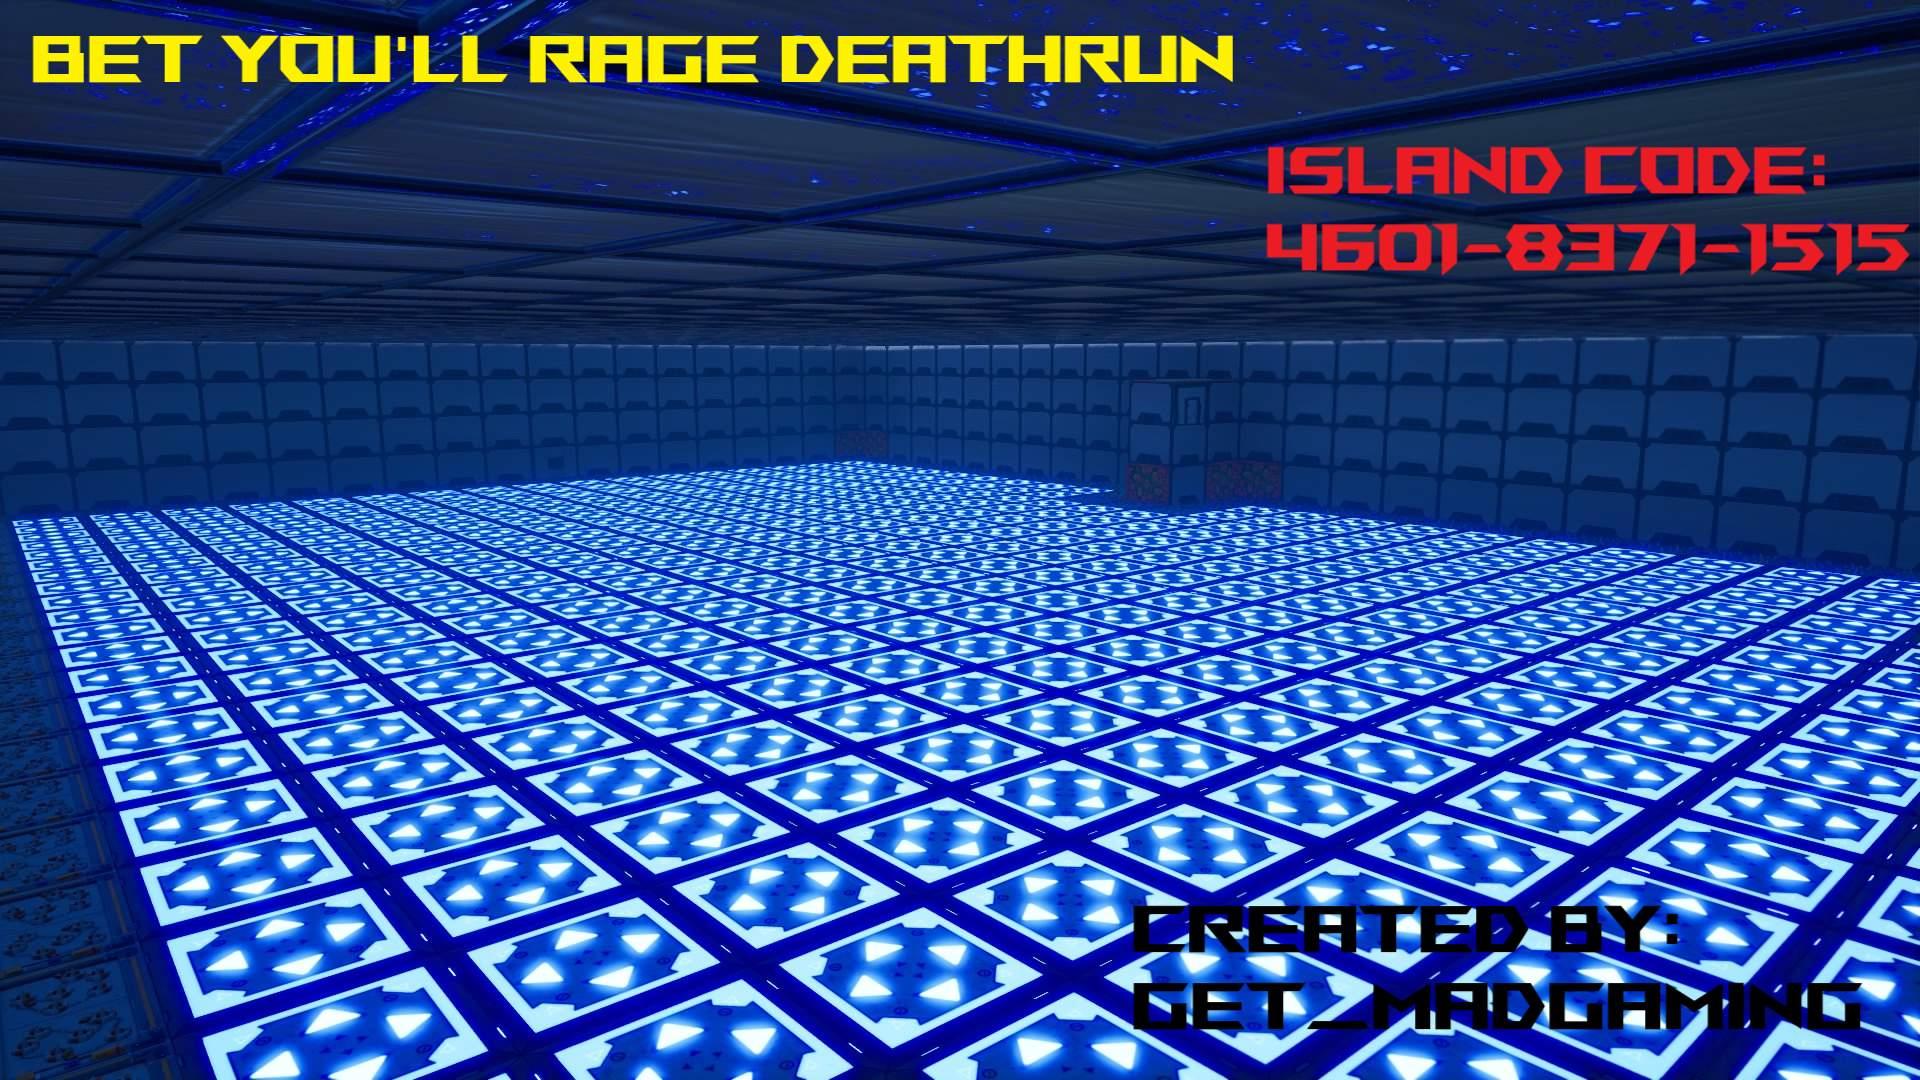 New Deathrun Take 2 Roblox Rage New Maps Bet You Ll Rage Deathrun Fortnite Creative Map Codes Dropnite Com